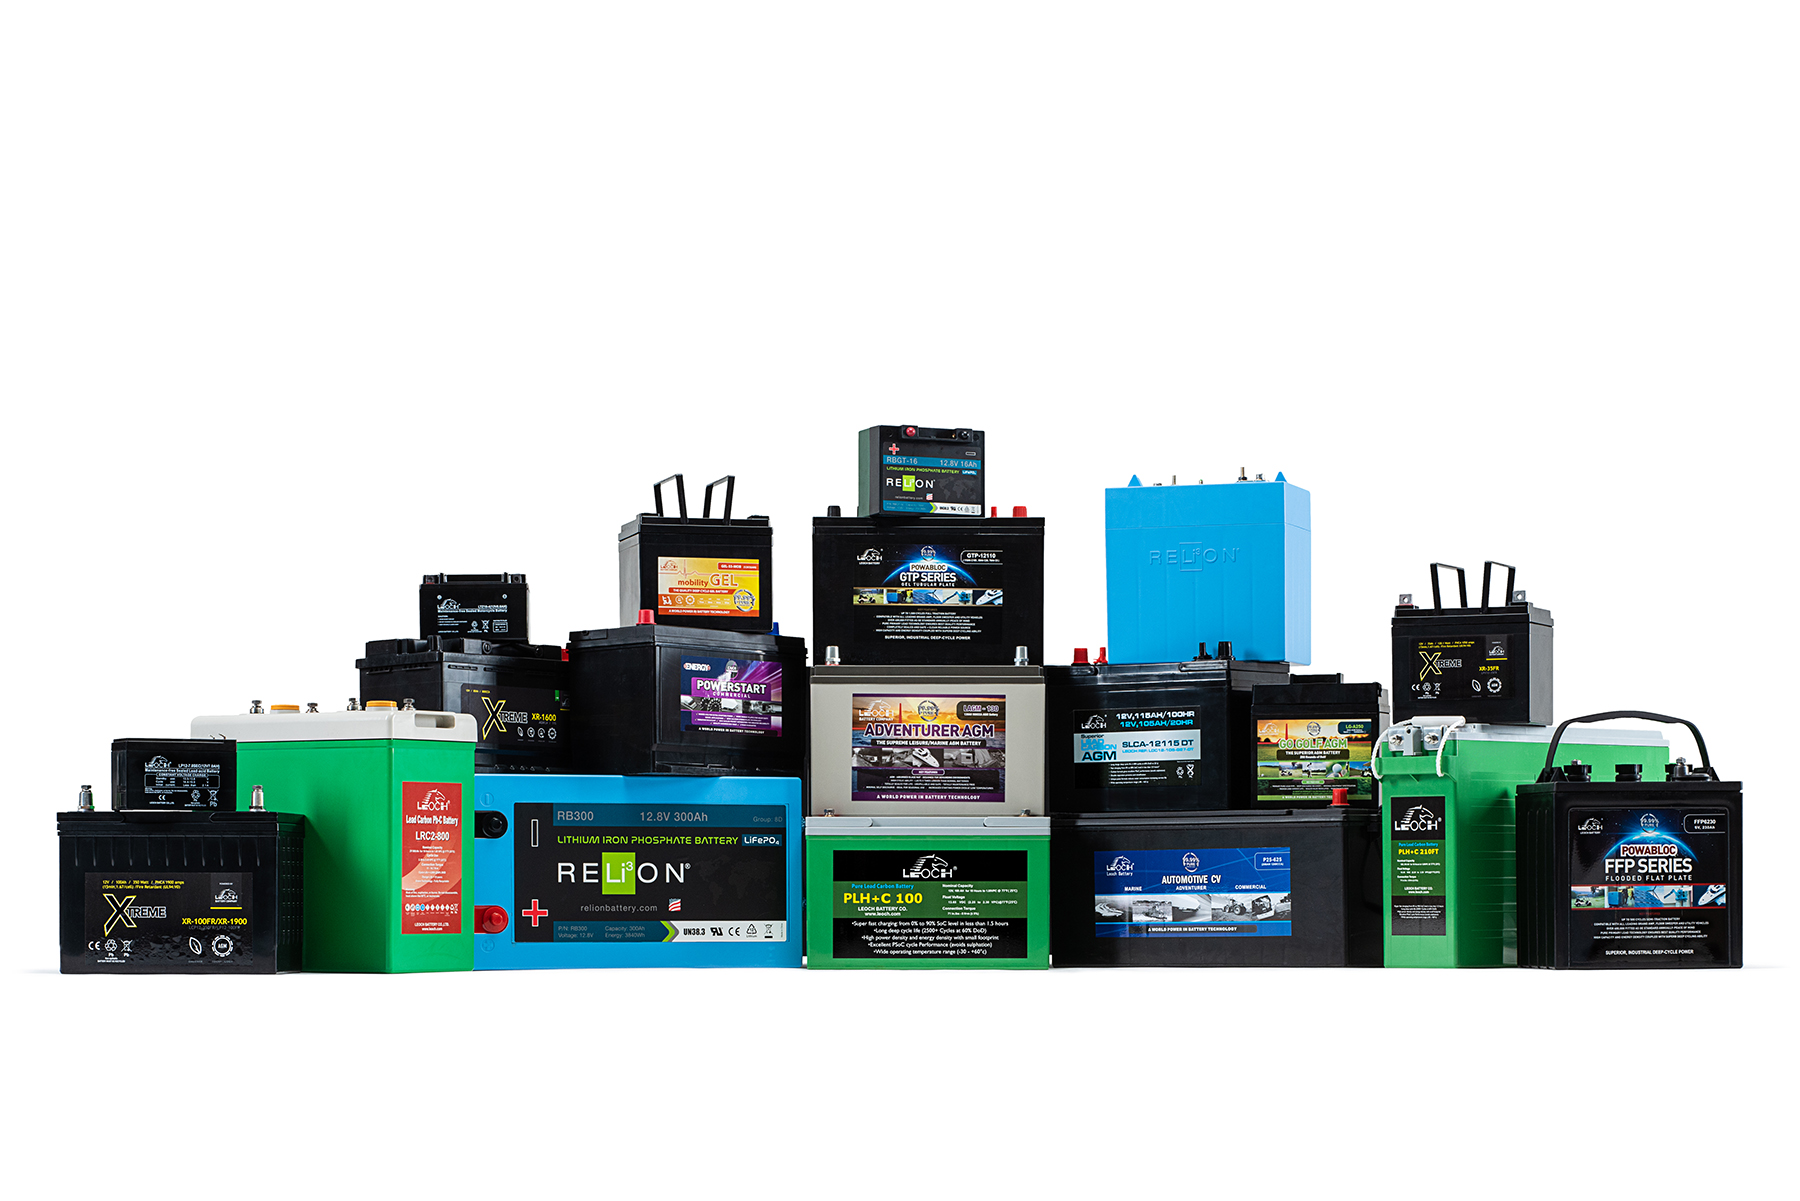 Full range image of large industrial batteries